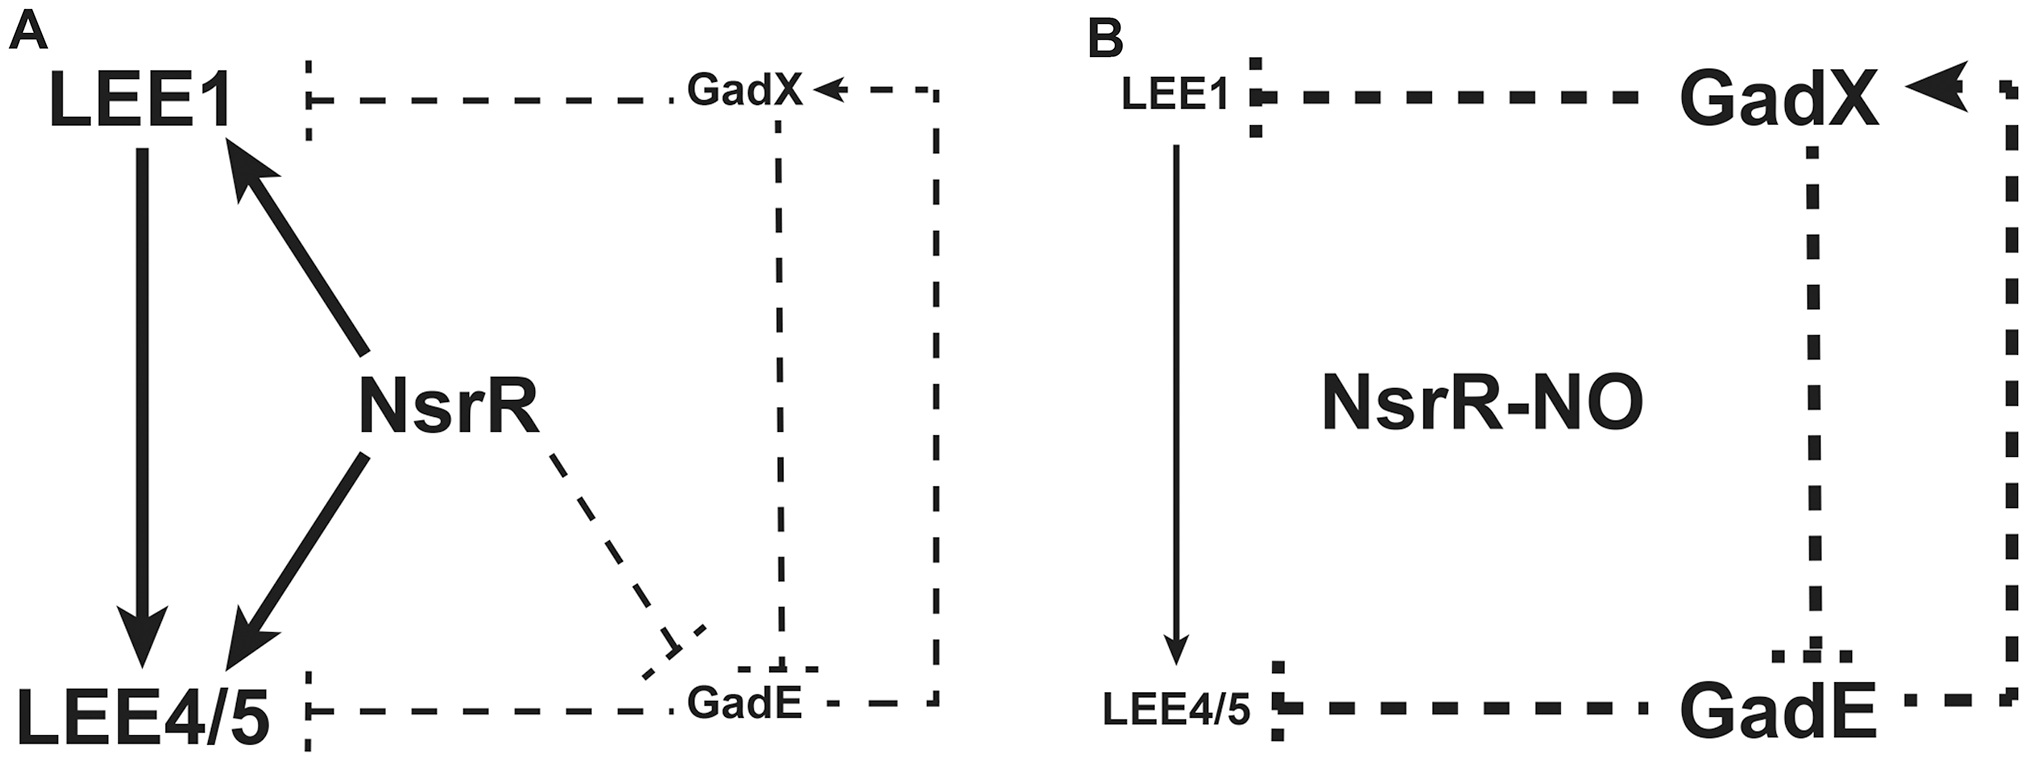 A model for the NO-dependent regulation of LEE1/4/5.